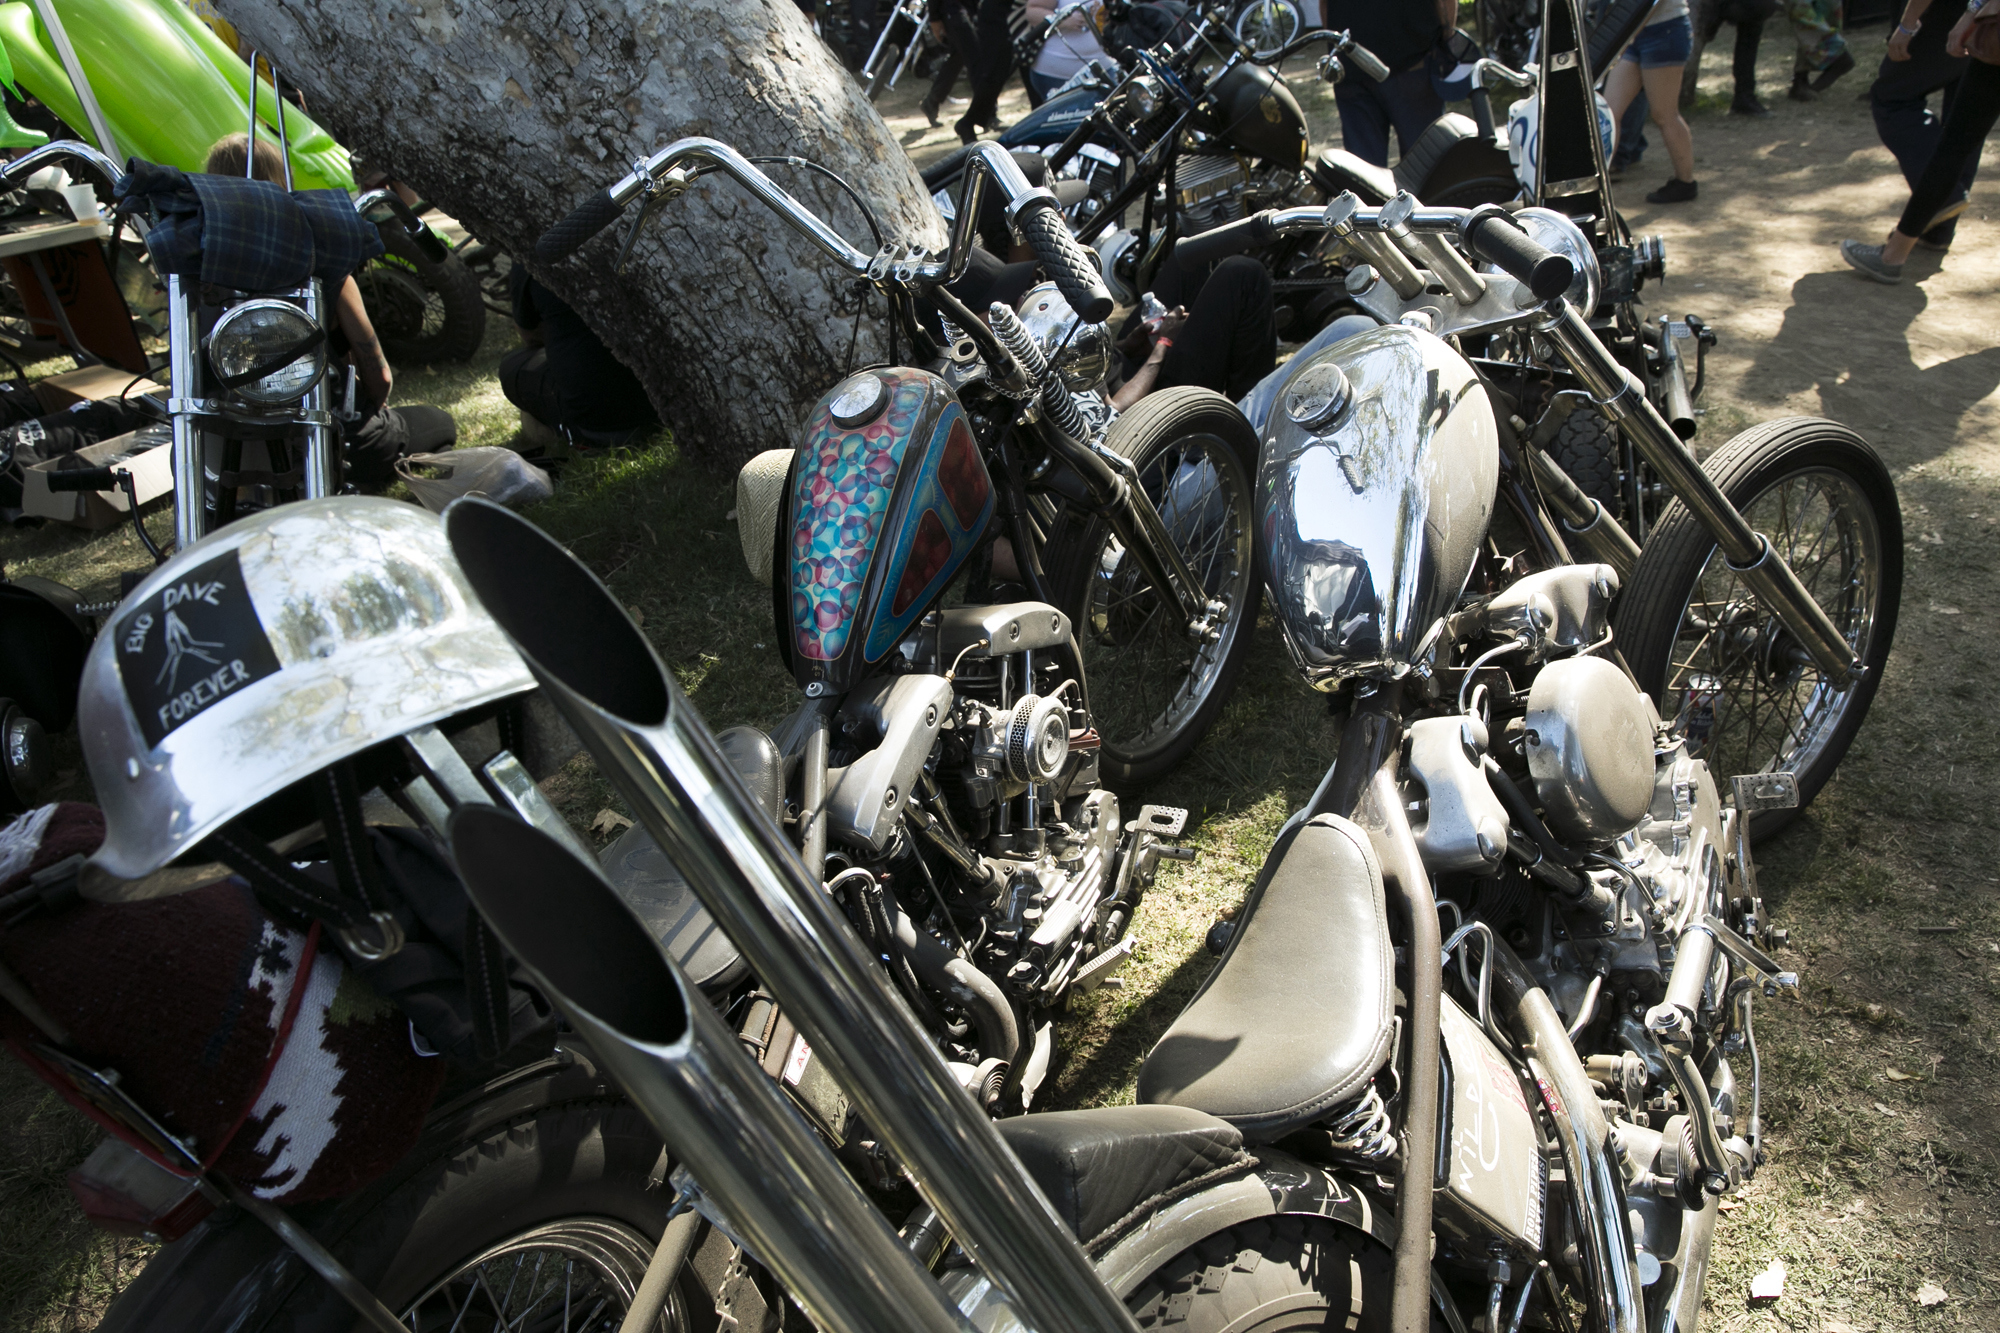 Born Free 8 Motorcycle Show-101.jpg